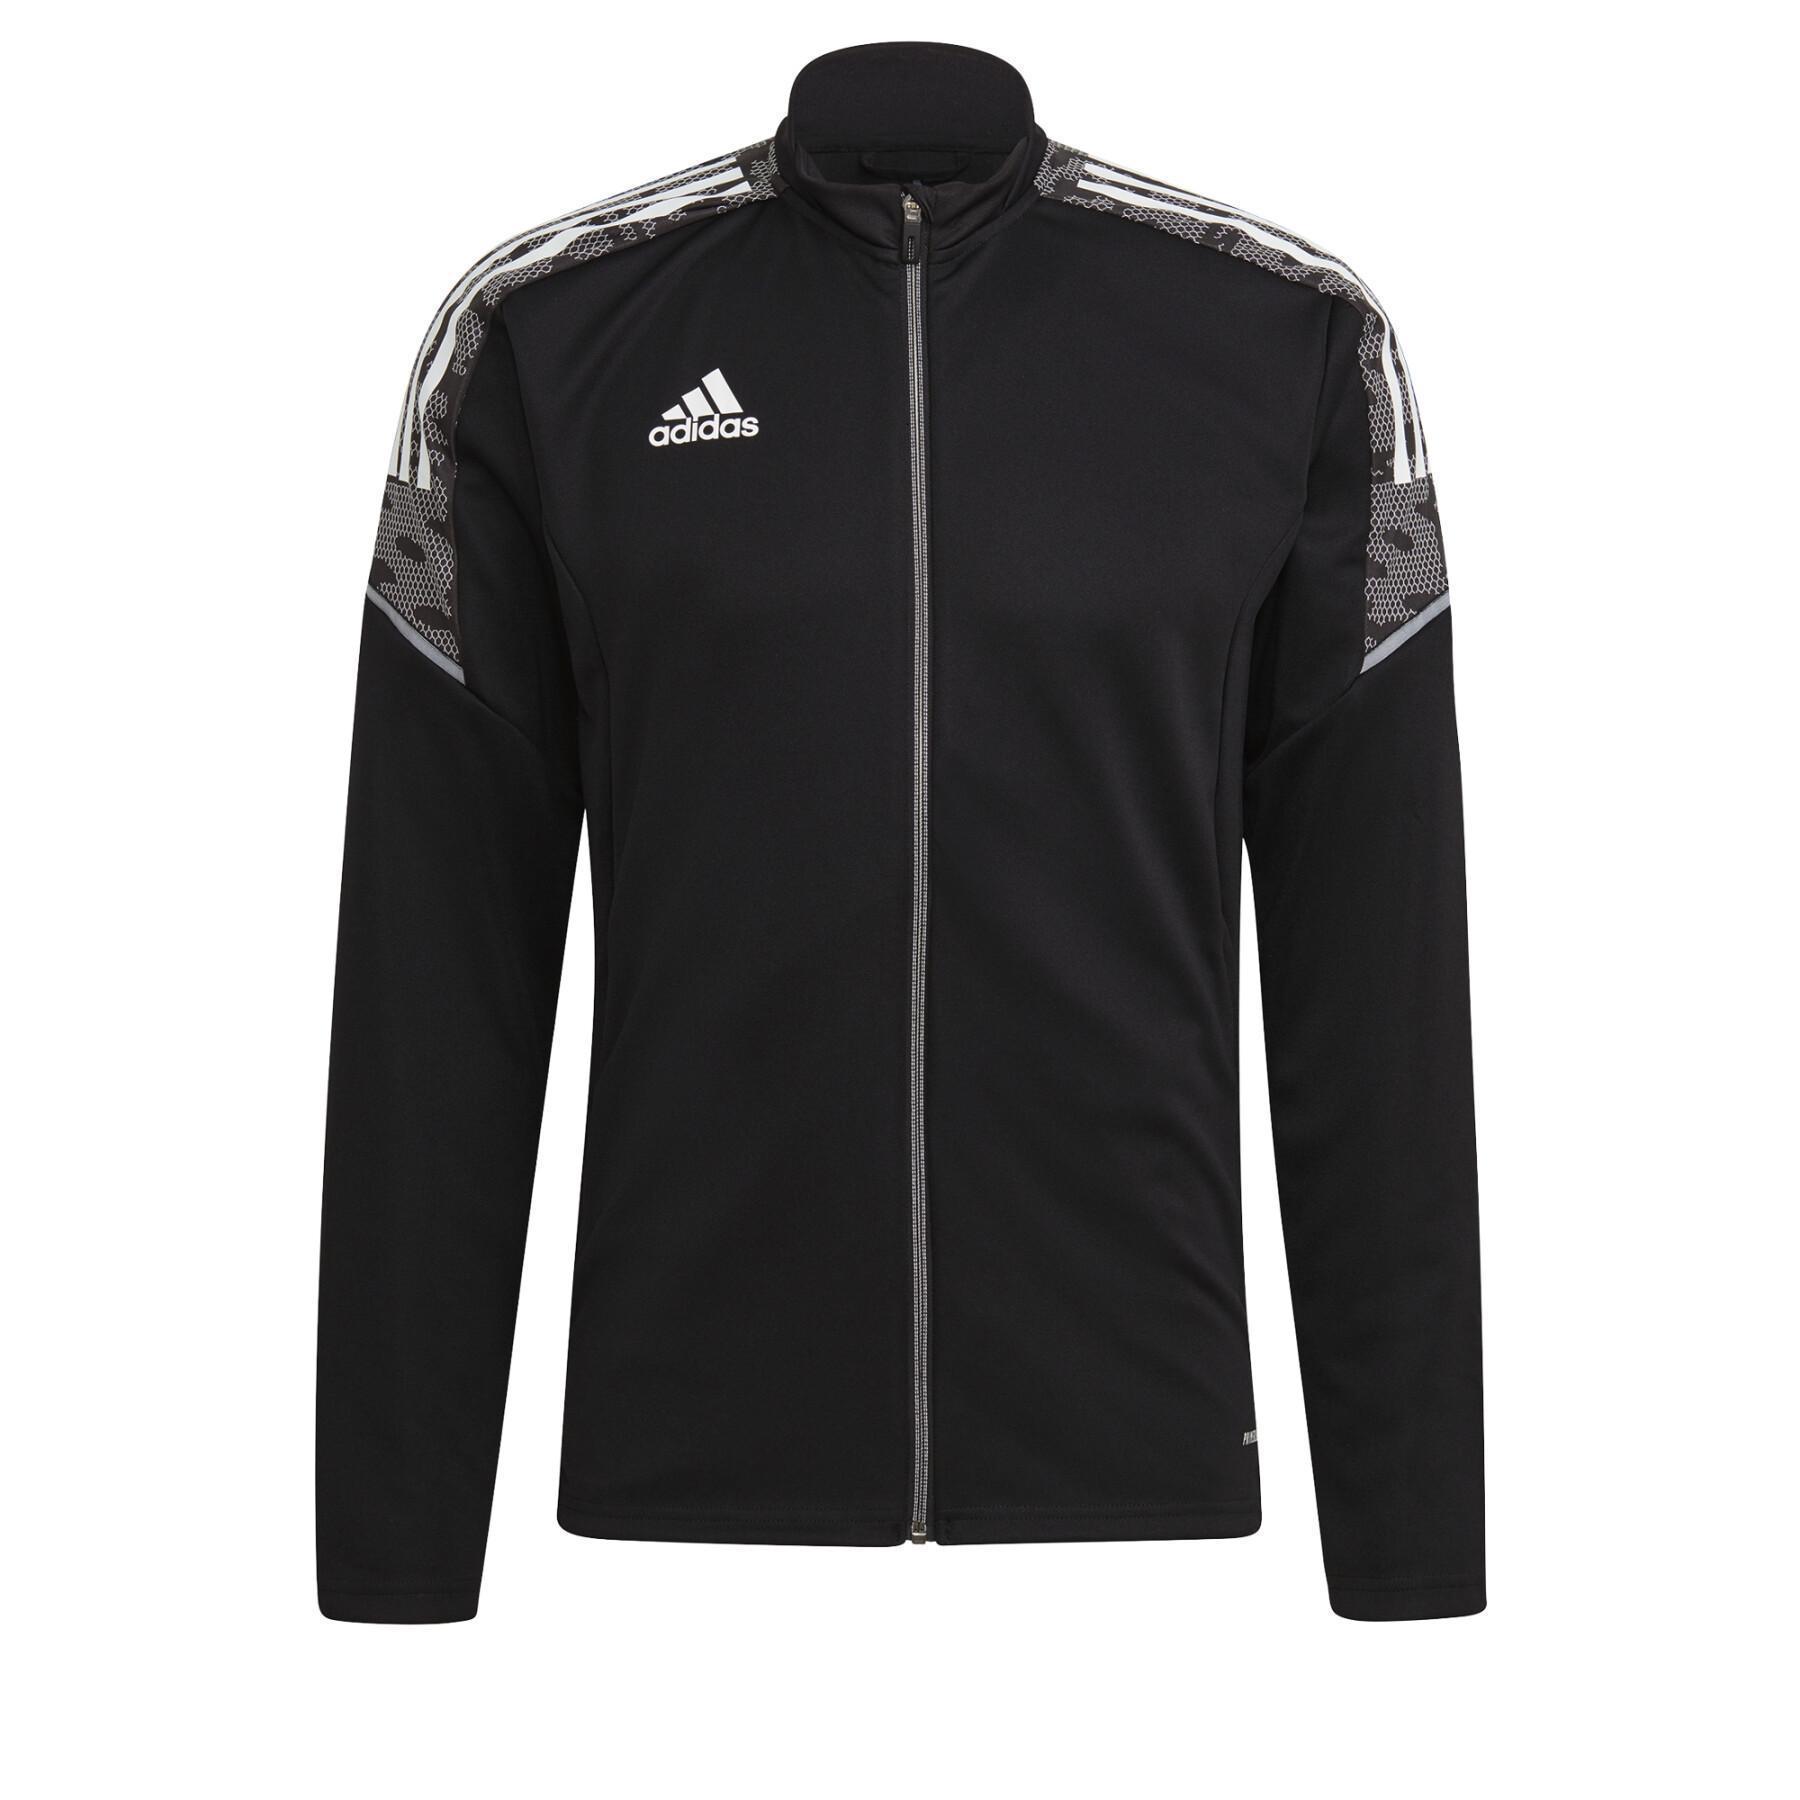 Jacket adidas Condivo 21 Primeblue